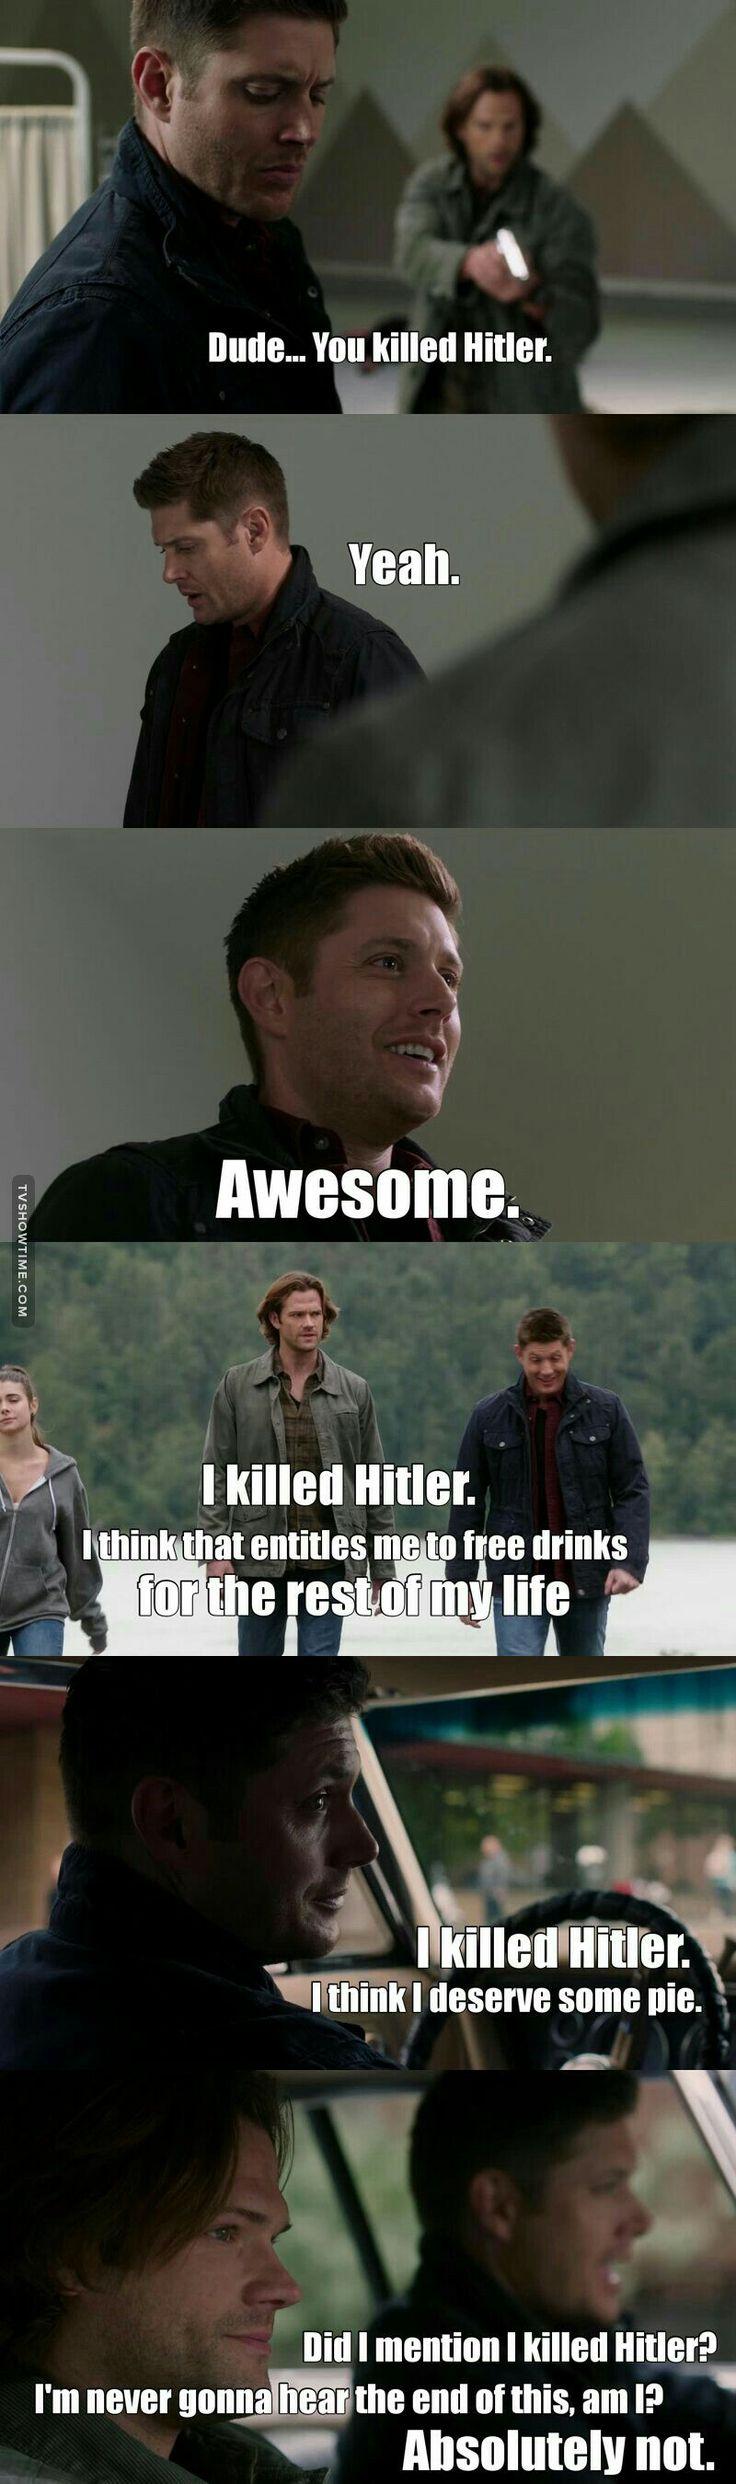 supernatural killed Hitler awesome season 12